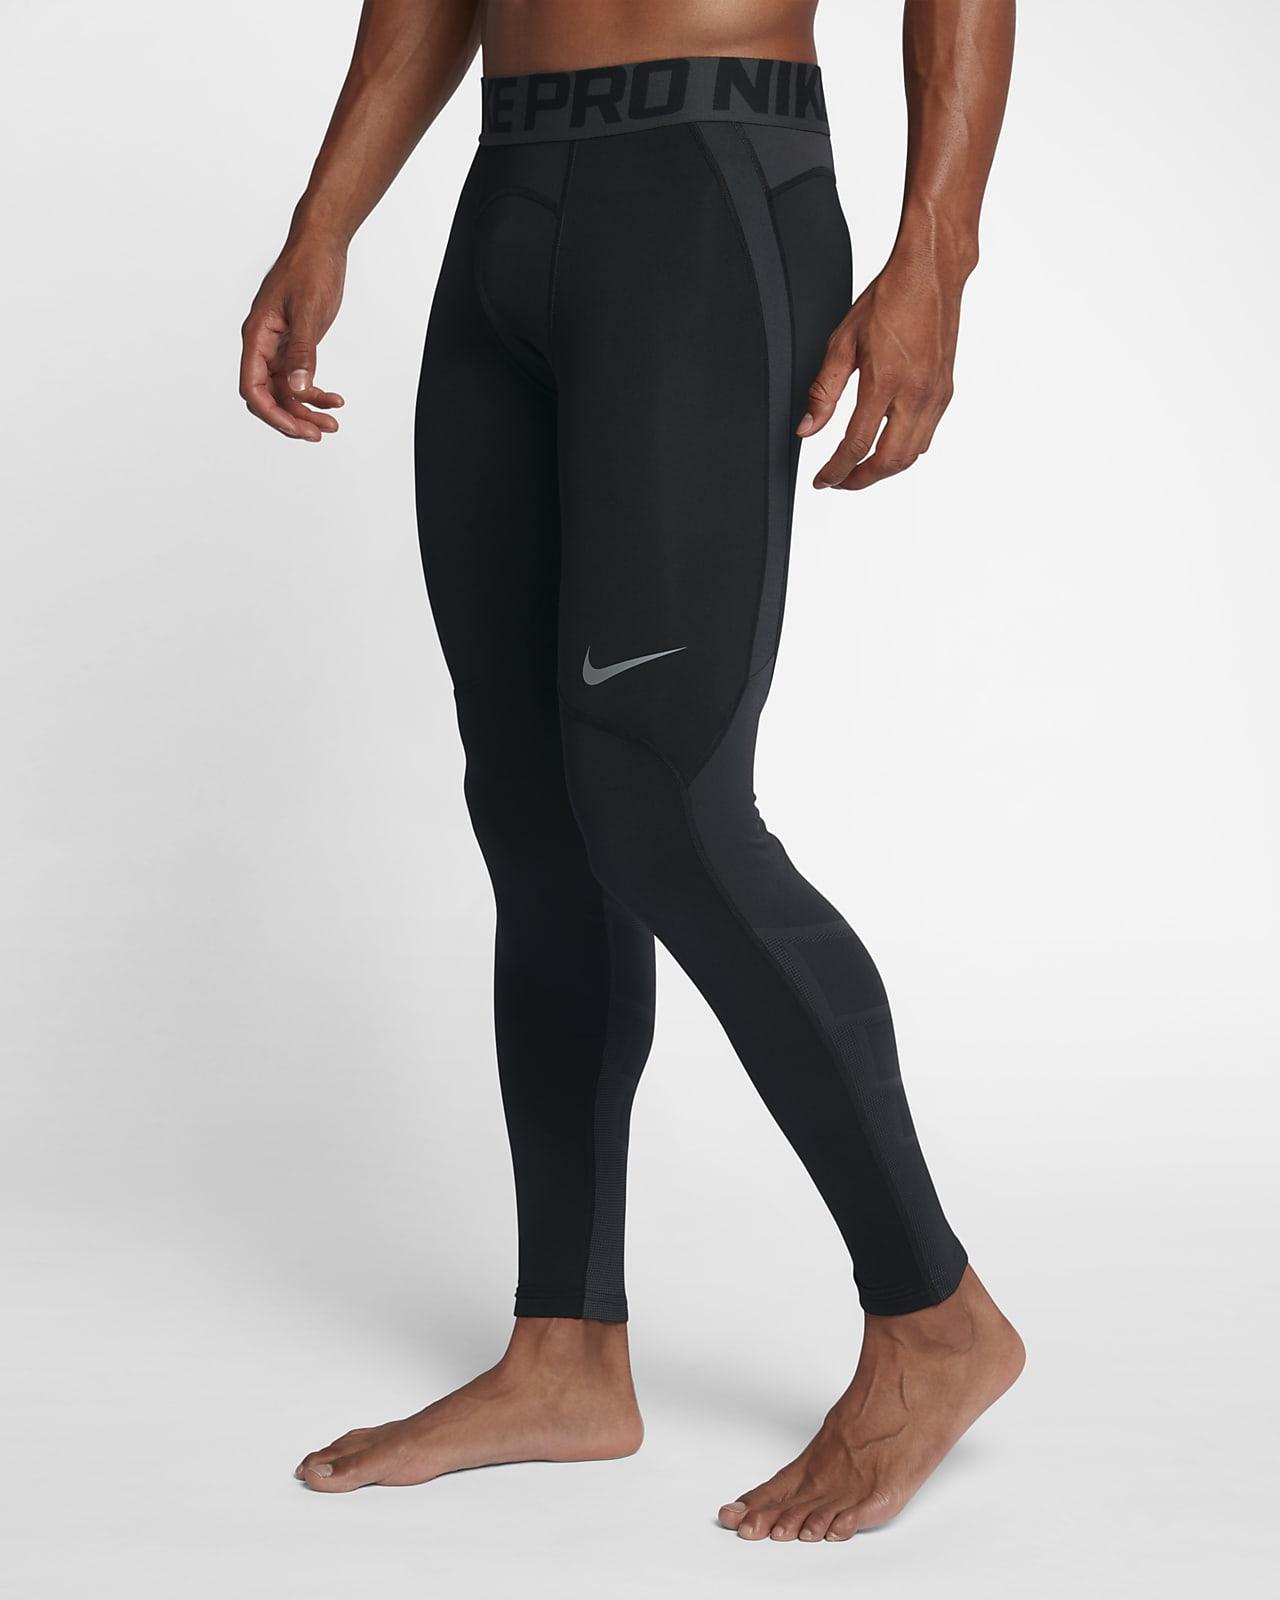 Nike Pro HyperWarm Men's Tights